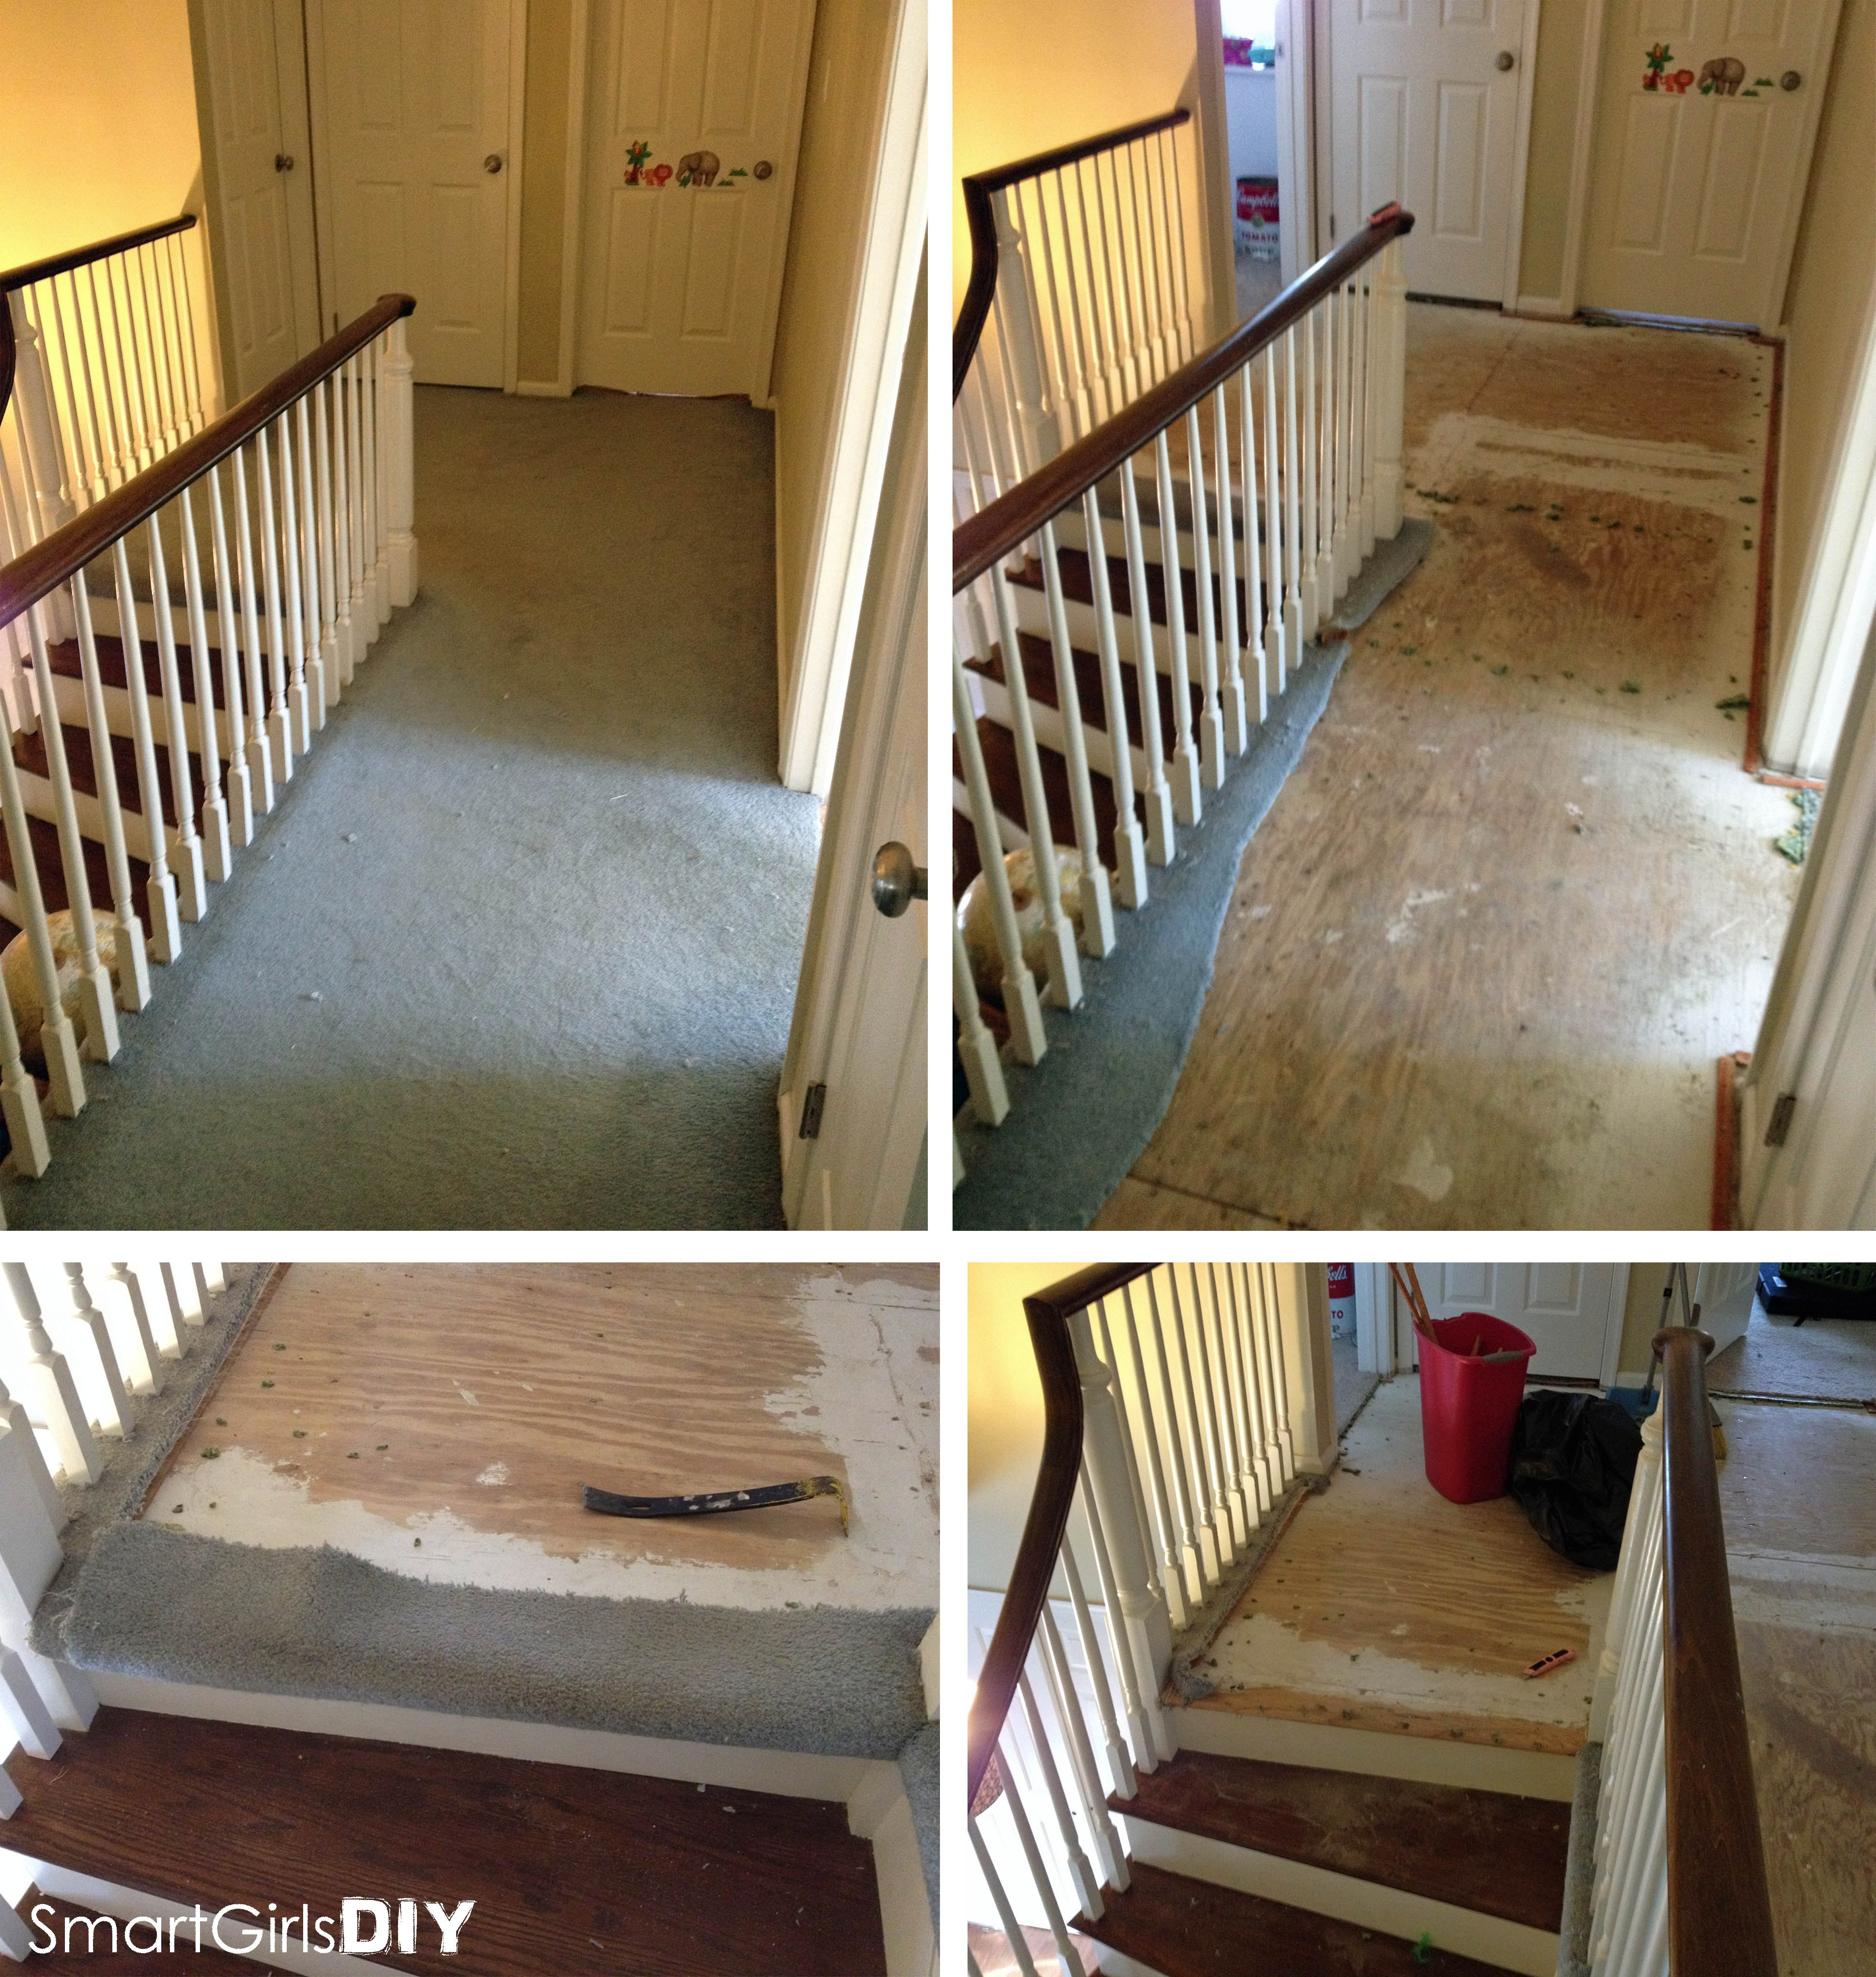 best moisture barrier for hardwood floors of upstairs hallway 1 installing hardwood floors regarding removing carpet from hallway installing the hardwood floor